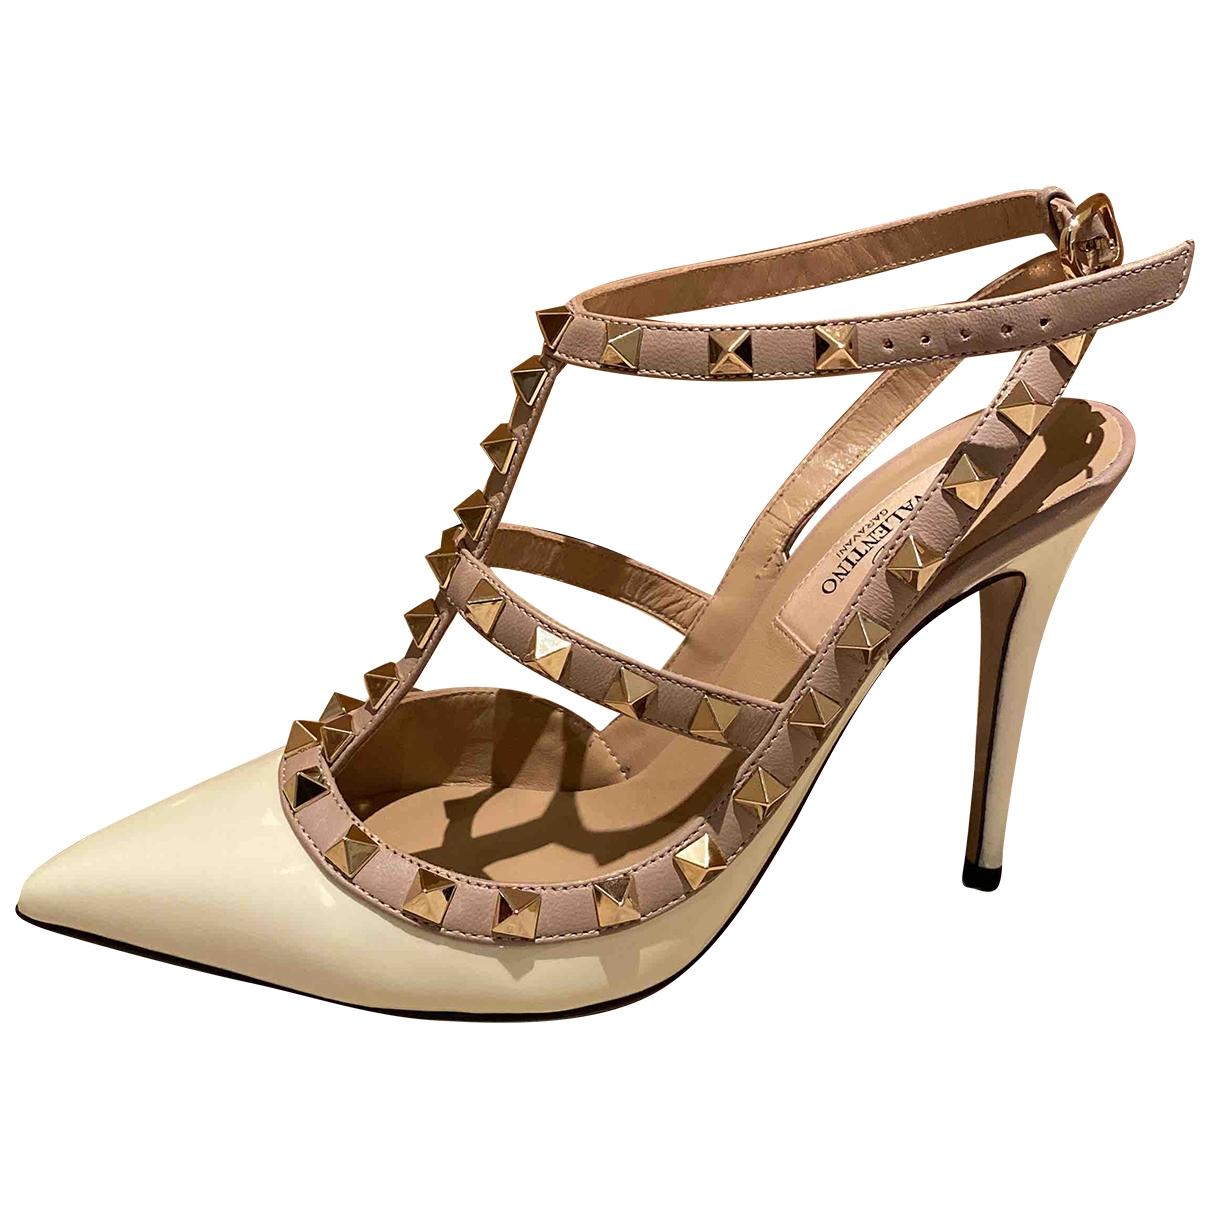 Valentino Garavani Rockstud White Patent leather Heels for Women 36.5 EU